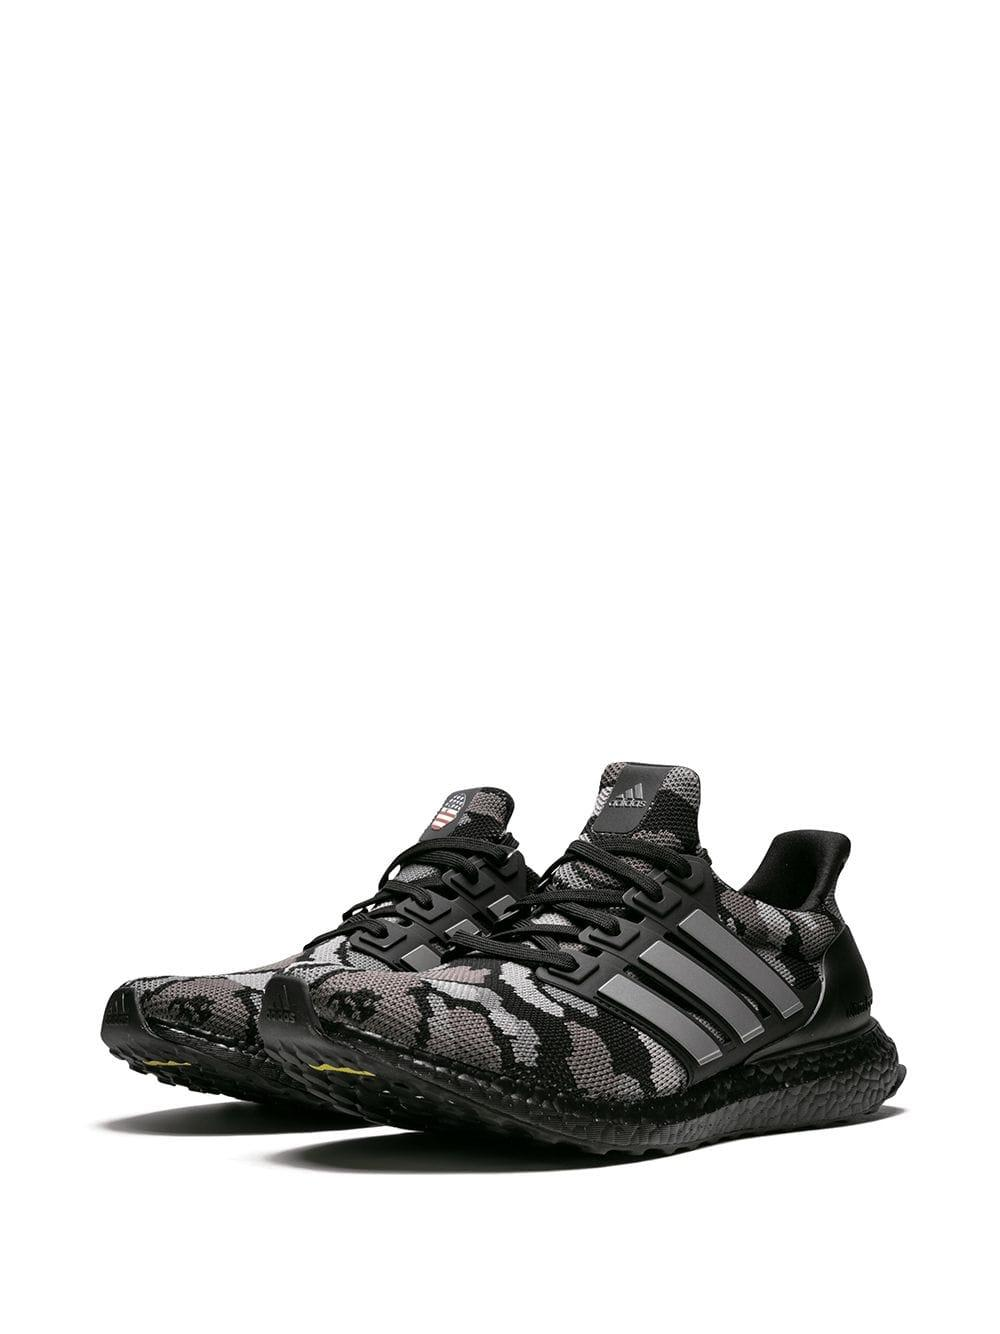 98563c75a Adidas - Black X Yeezy Ultra Boost Bape X Sneakers for Men - Lyst. View  fullscreen